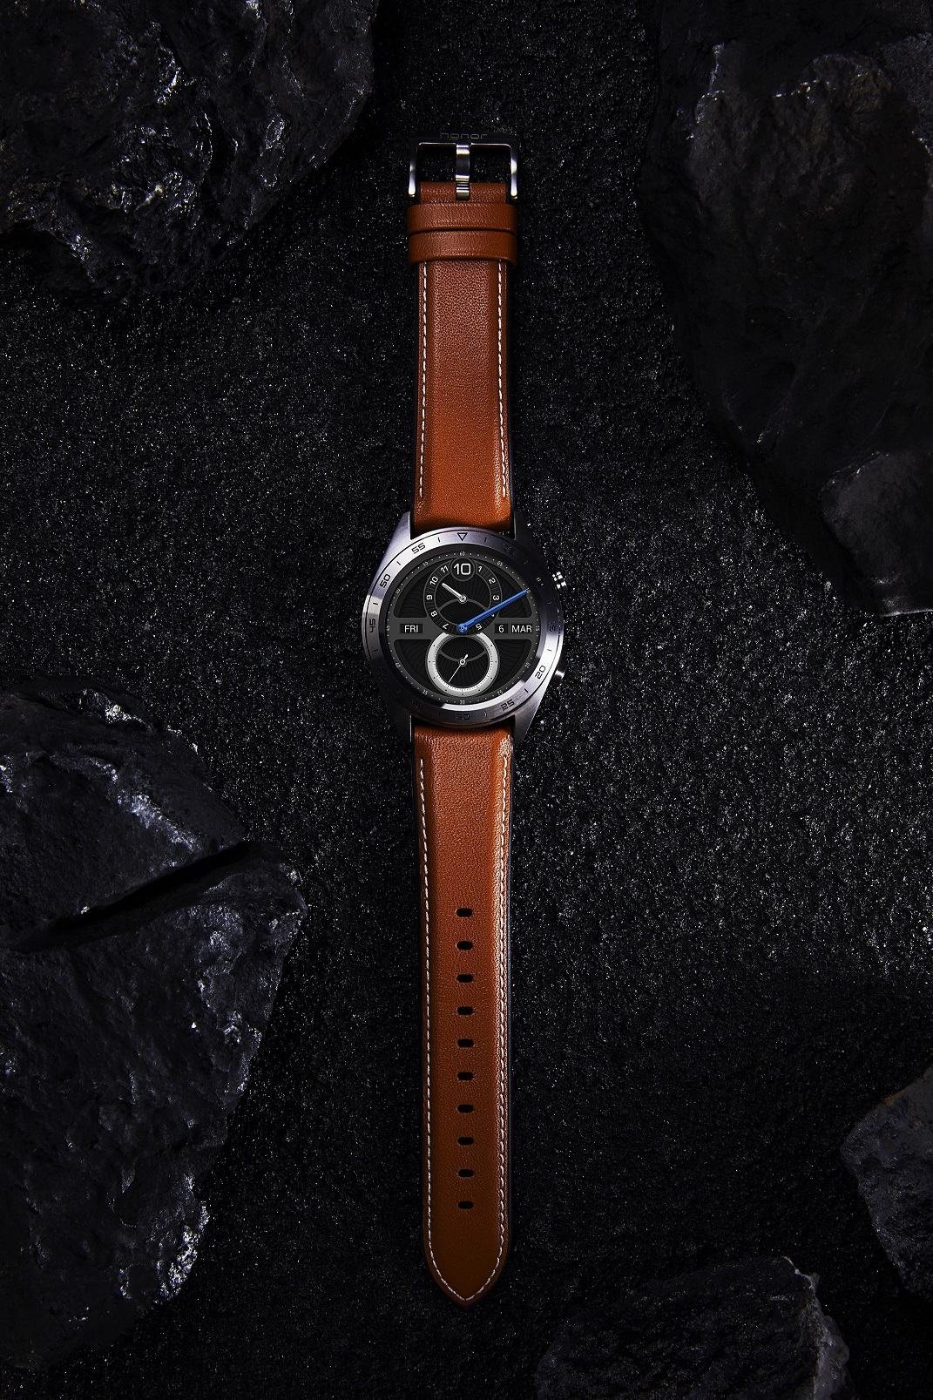 Watch Magic, Honor Watch Magic, cena Watch Magic, specyfikacja Watch Magic, sprzedaż Watch Magic, parametry Watch Magic, polska Watch Magic